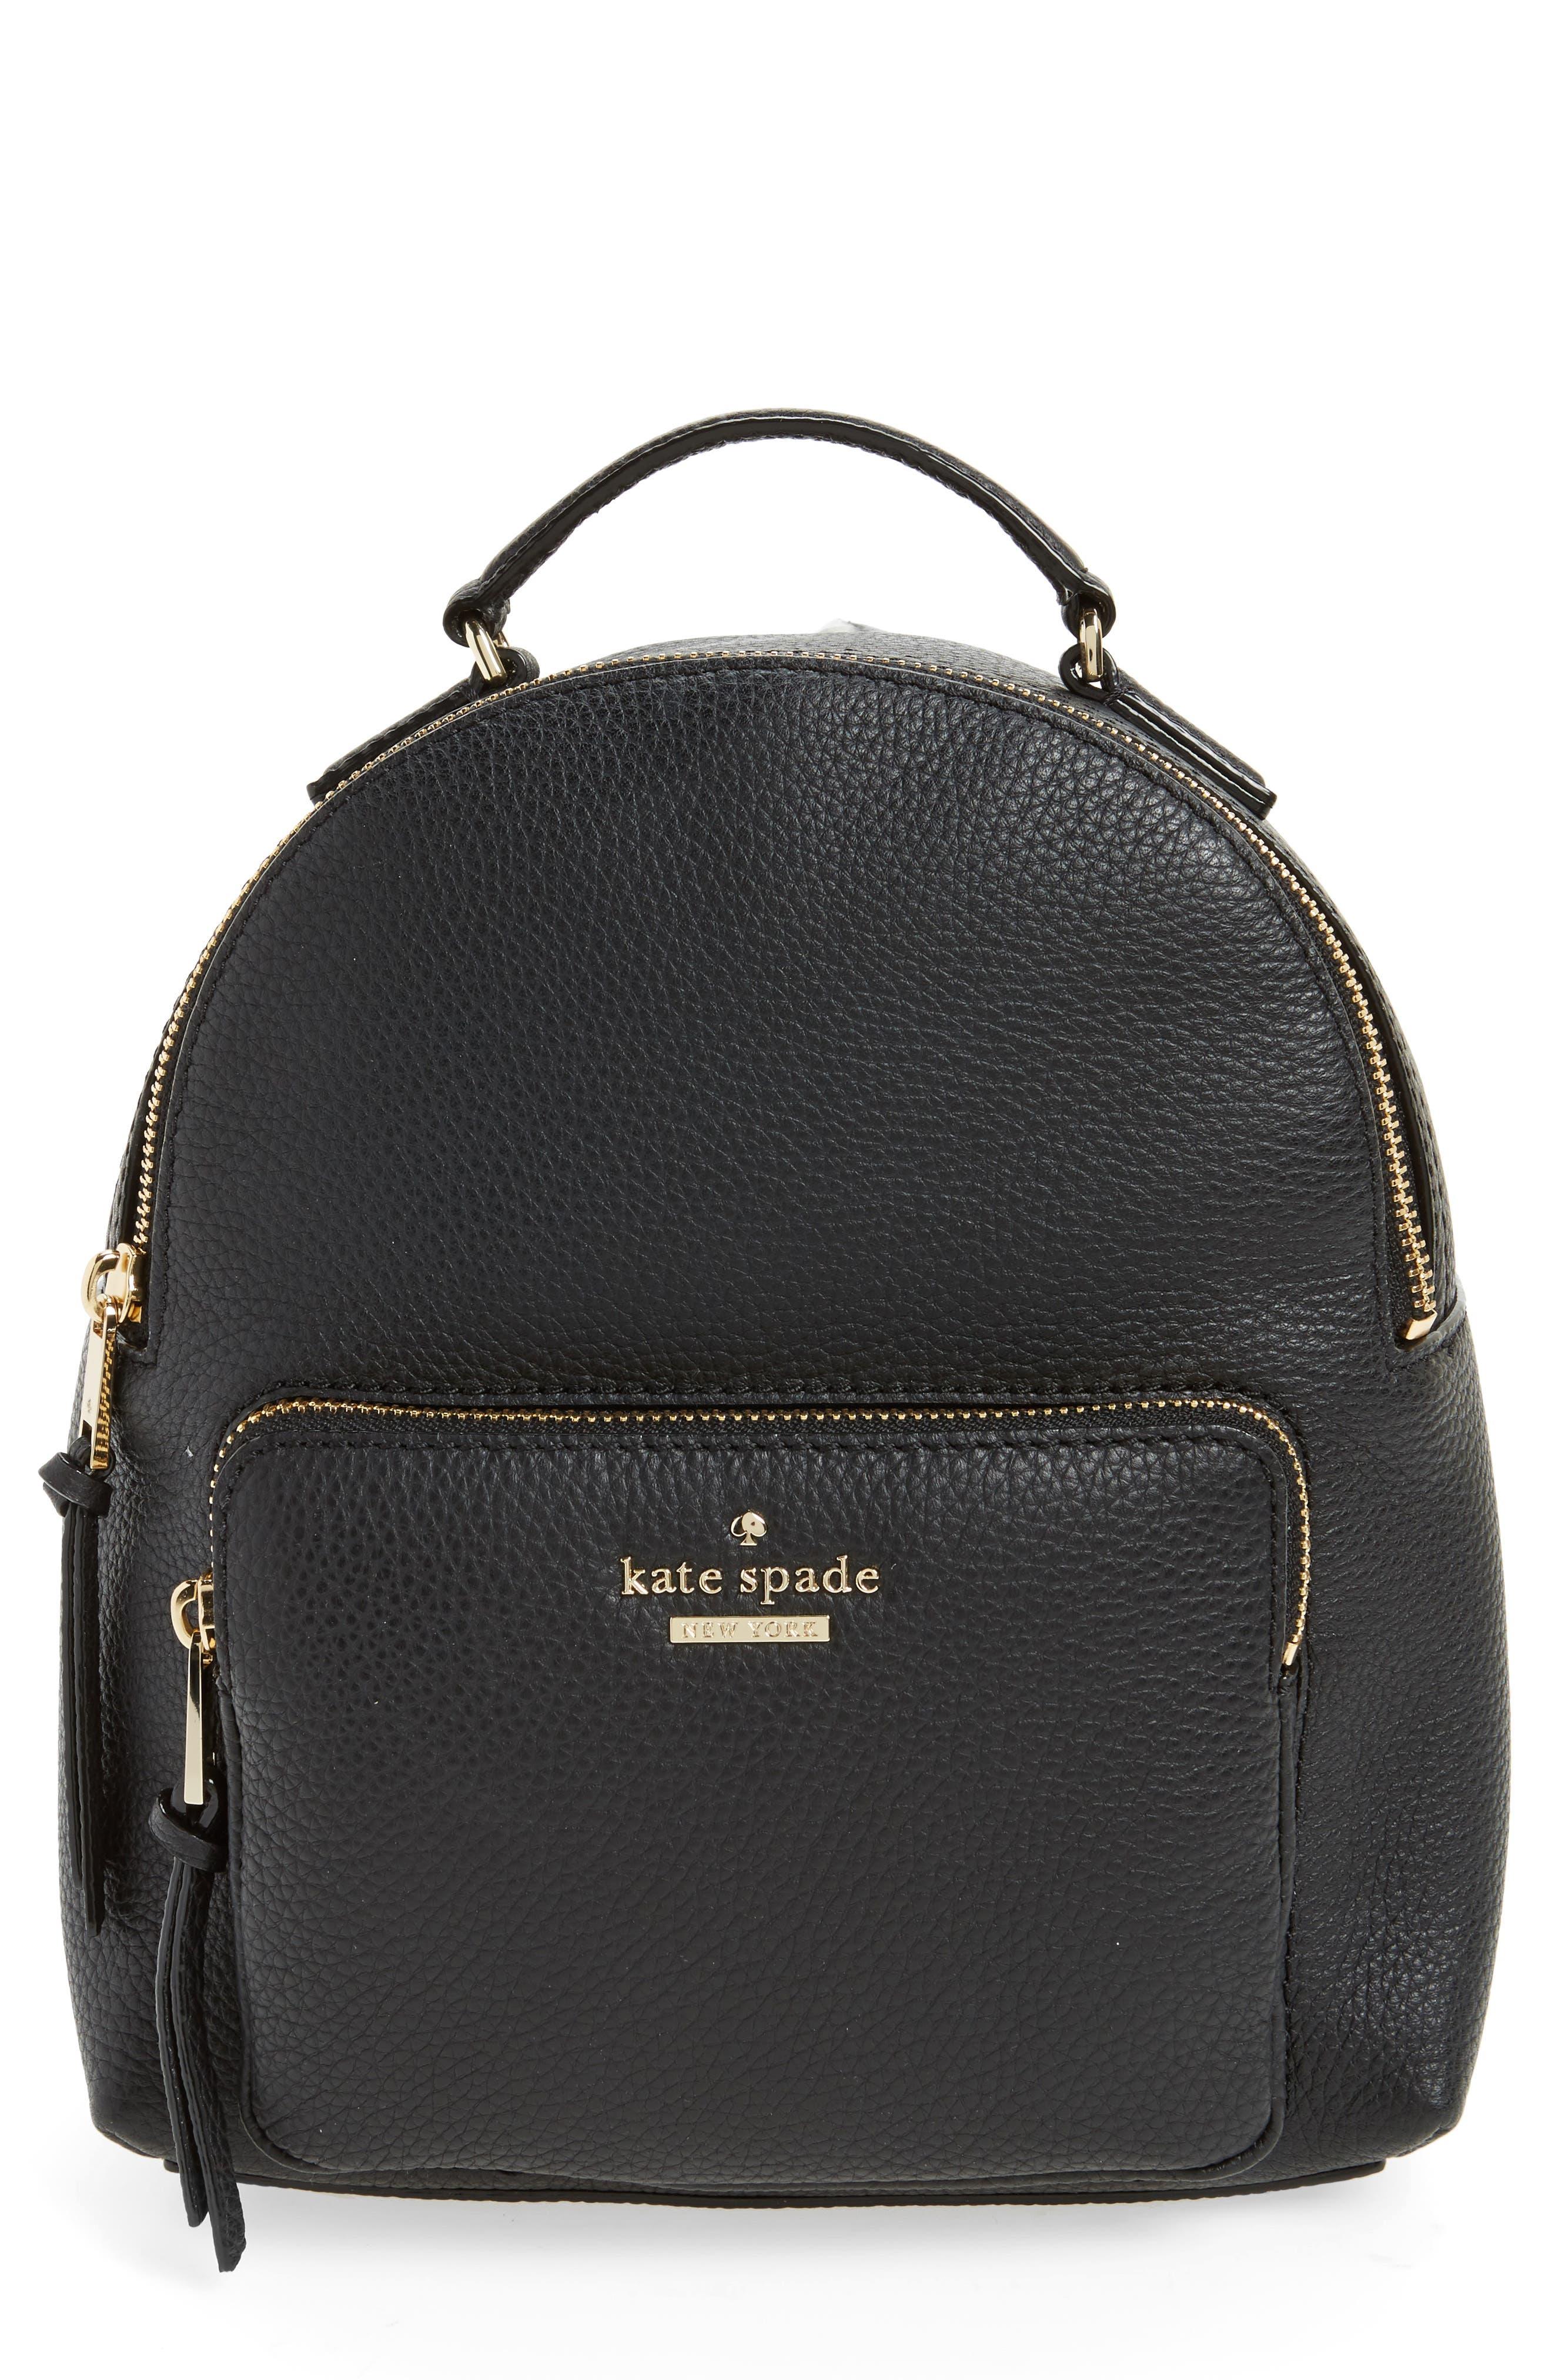 KATE SPADE NEW YORK,                             jackson street - keleigh leather backpack,                             Main thumbnail 1, color,                             BLACK